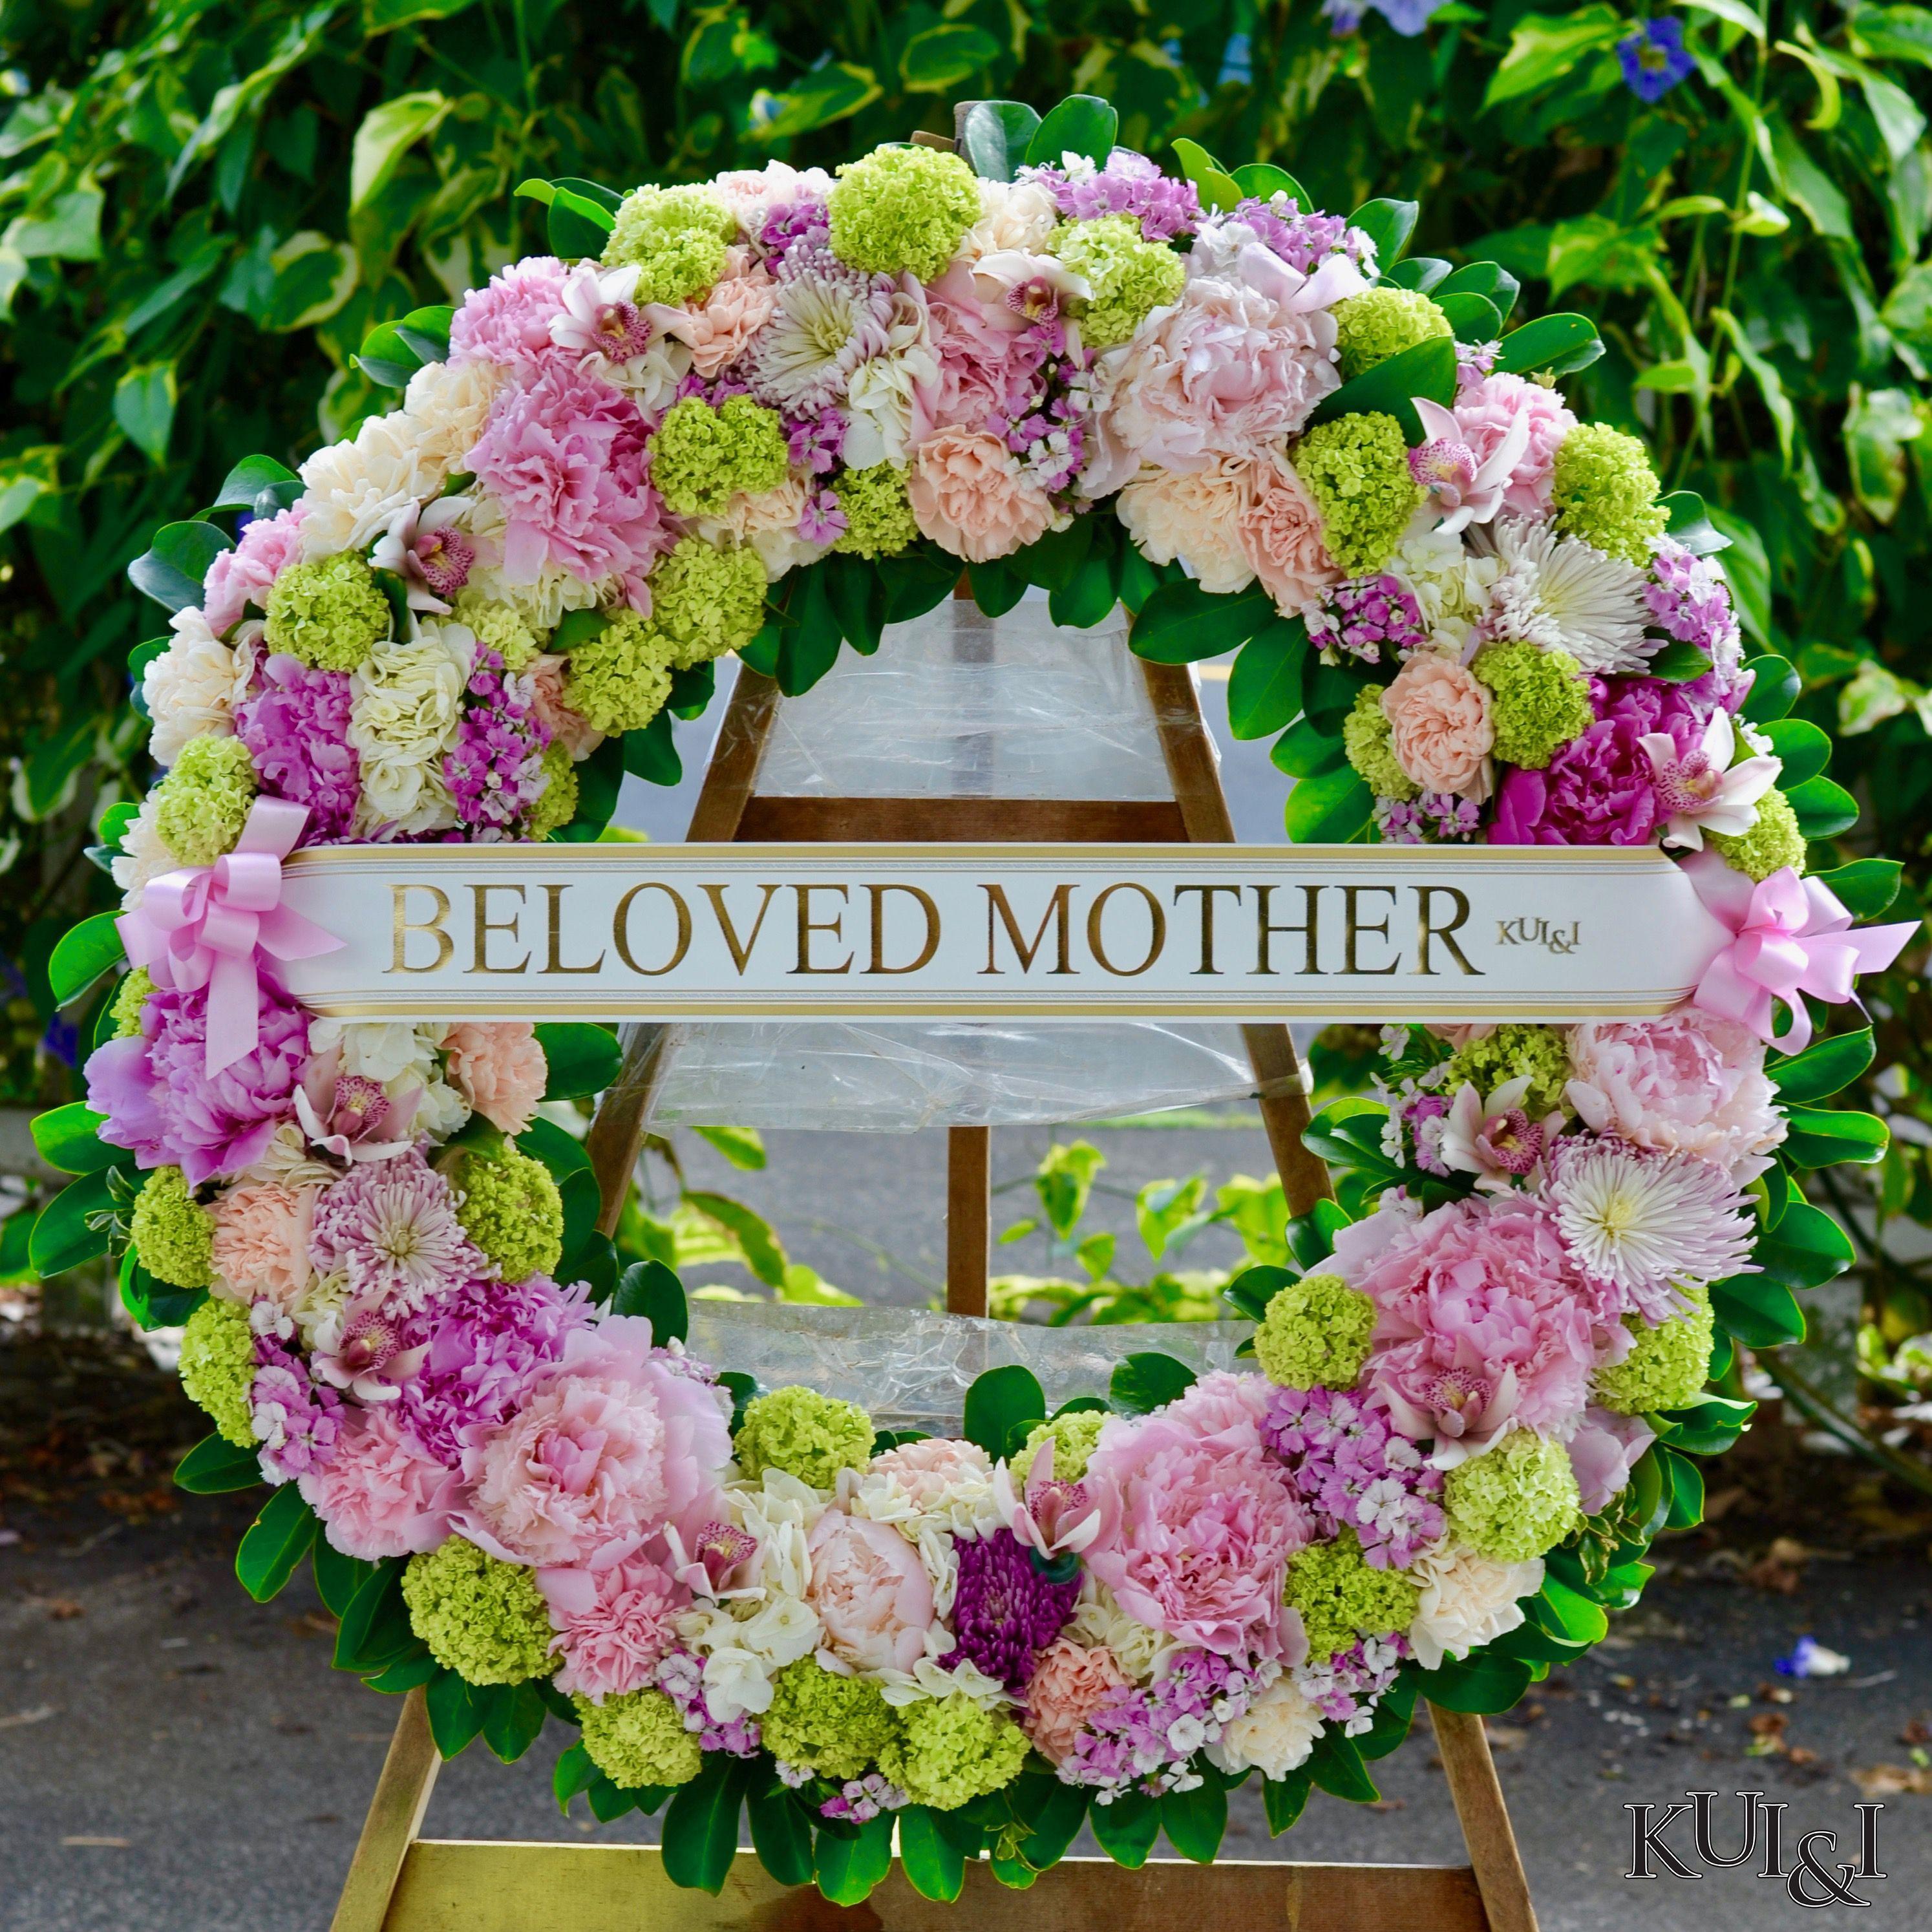 Spring Sympathy Wreath Kui I Florist Llc Hilo Hawaii